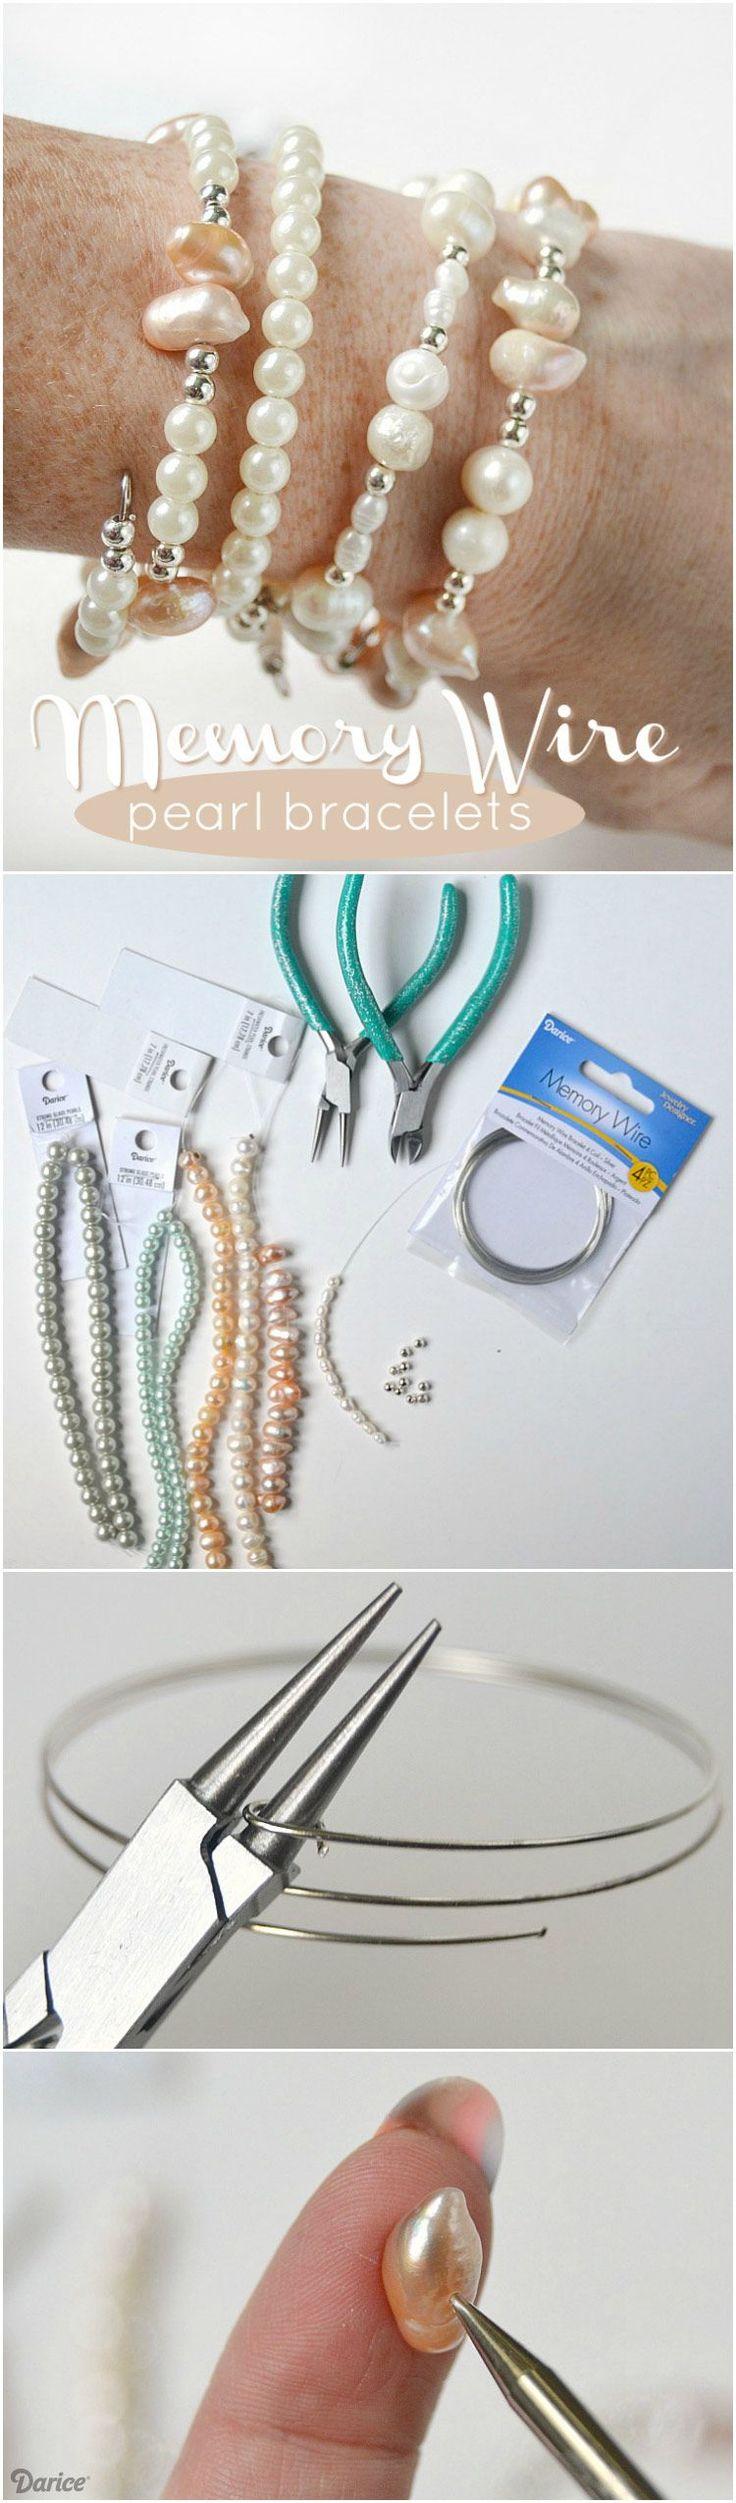 102 best Diy Schmuck images on Pinterest   Wire jewelry, Tree of ...